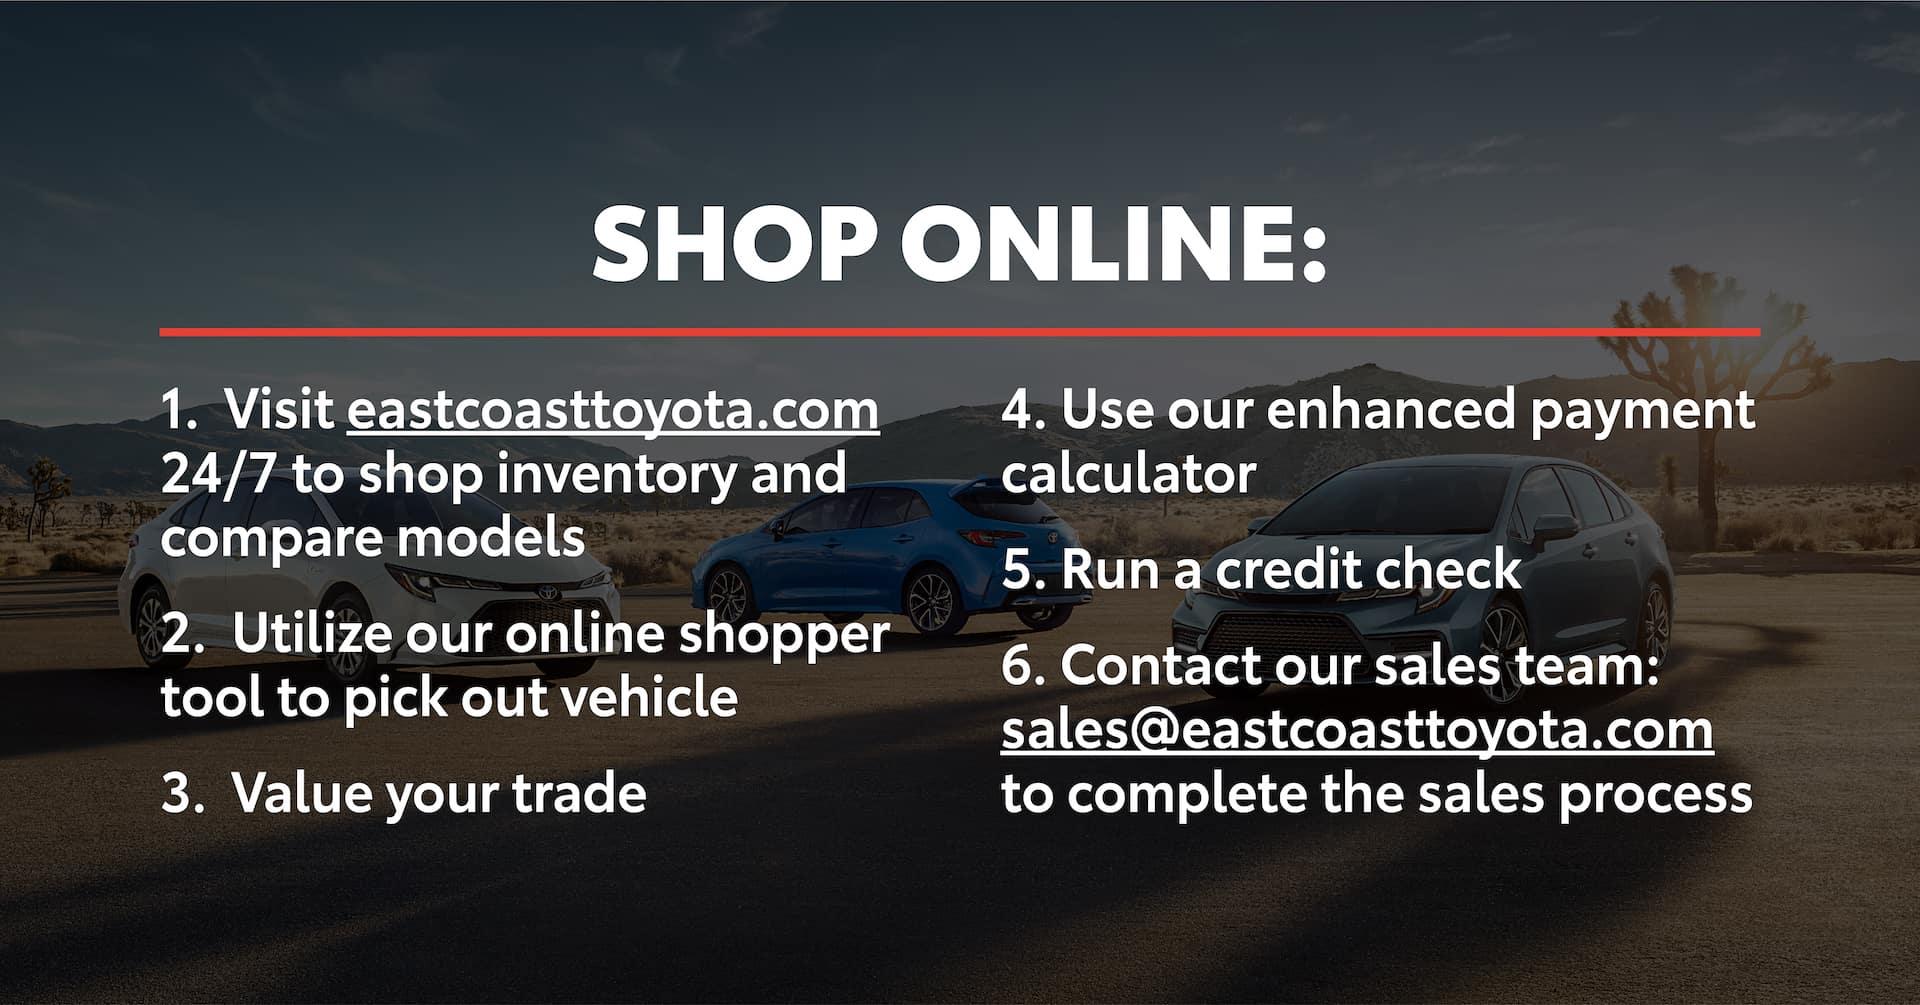 East Coast Toyota Shop Online